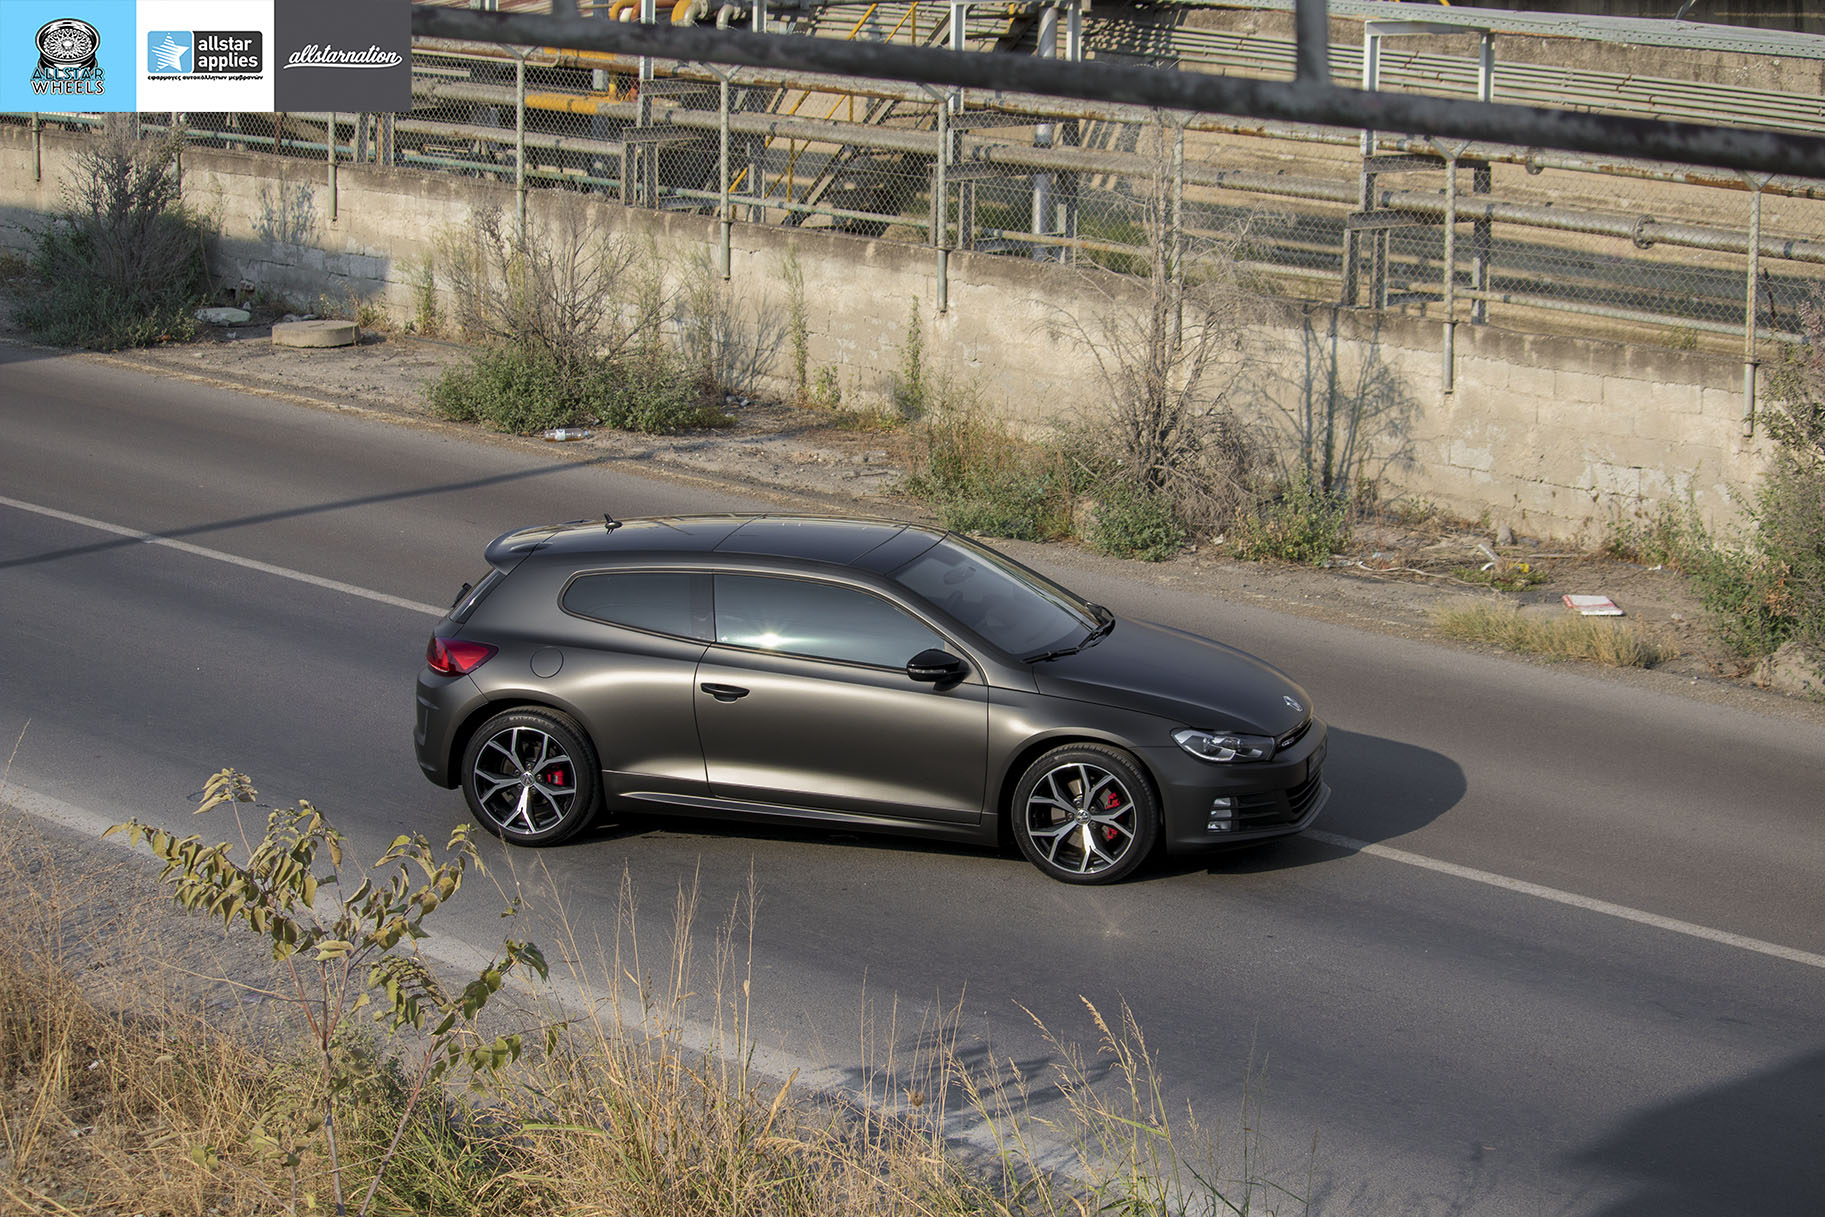 VW SCIROCCO MATT DIAMOND BLACK ALLSTAR APPLIES (15)